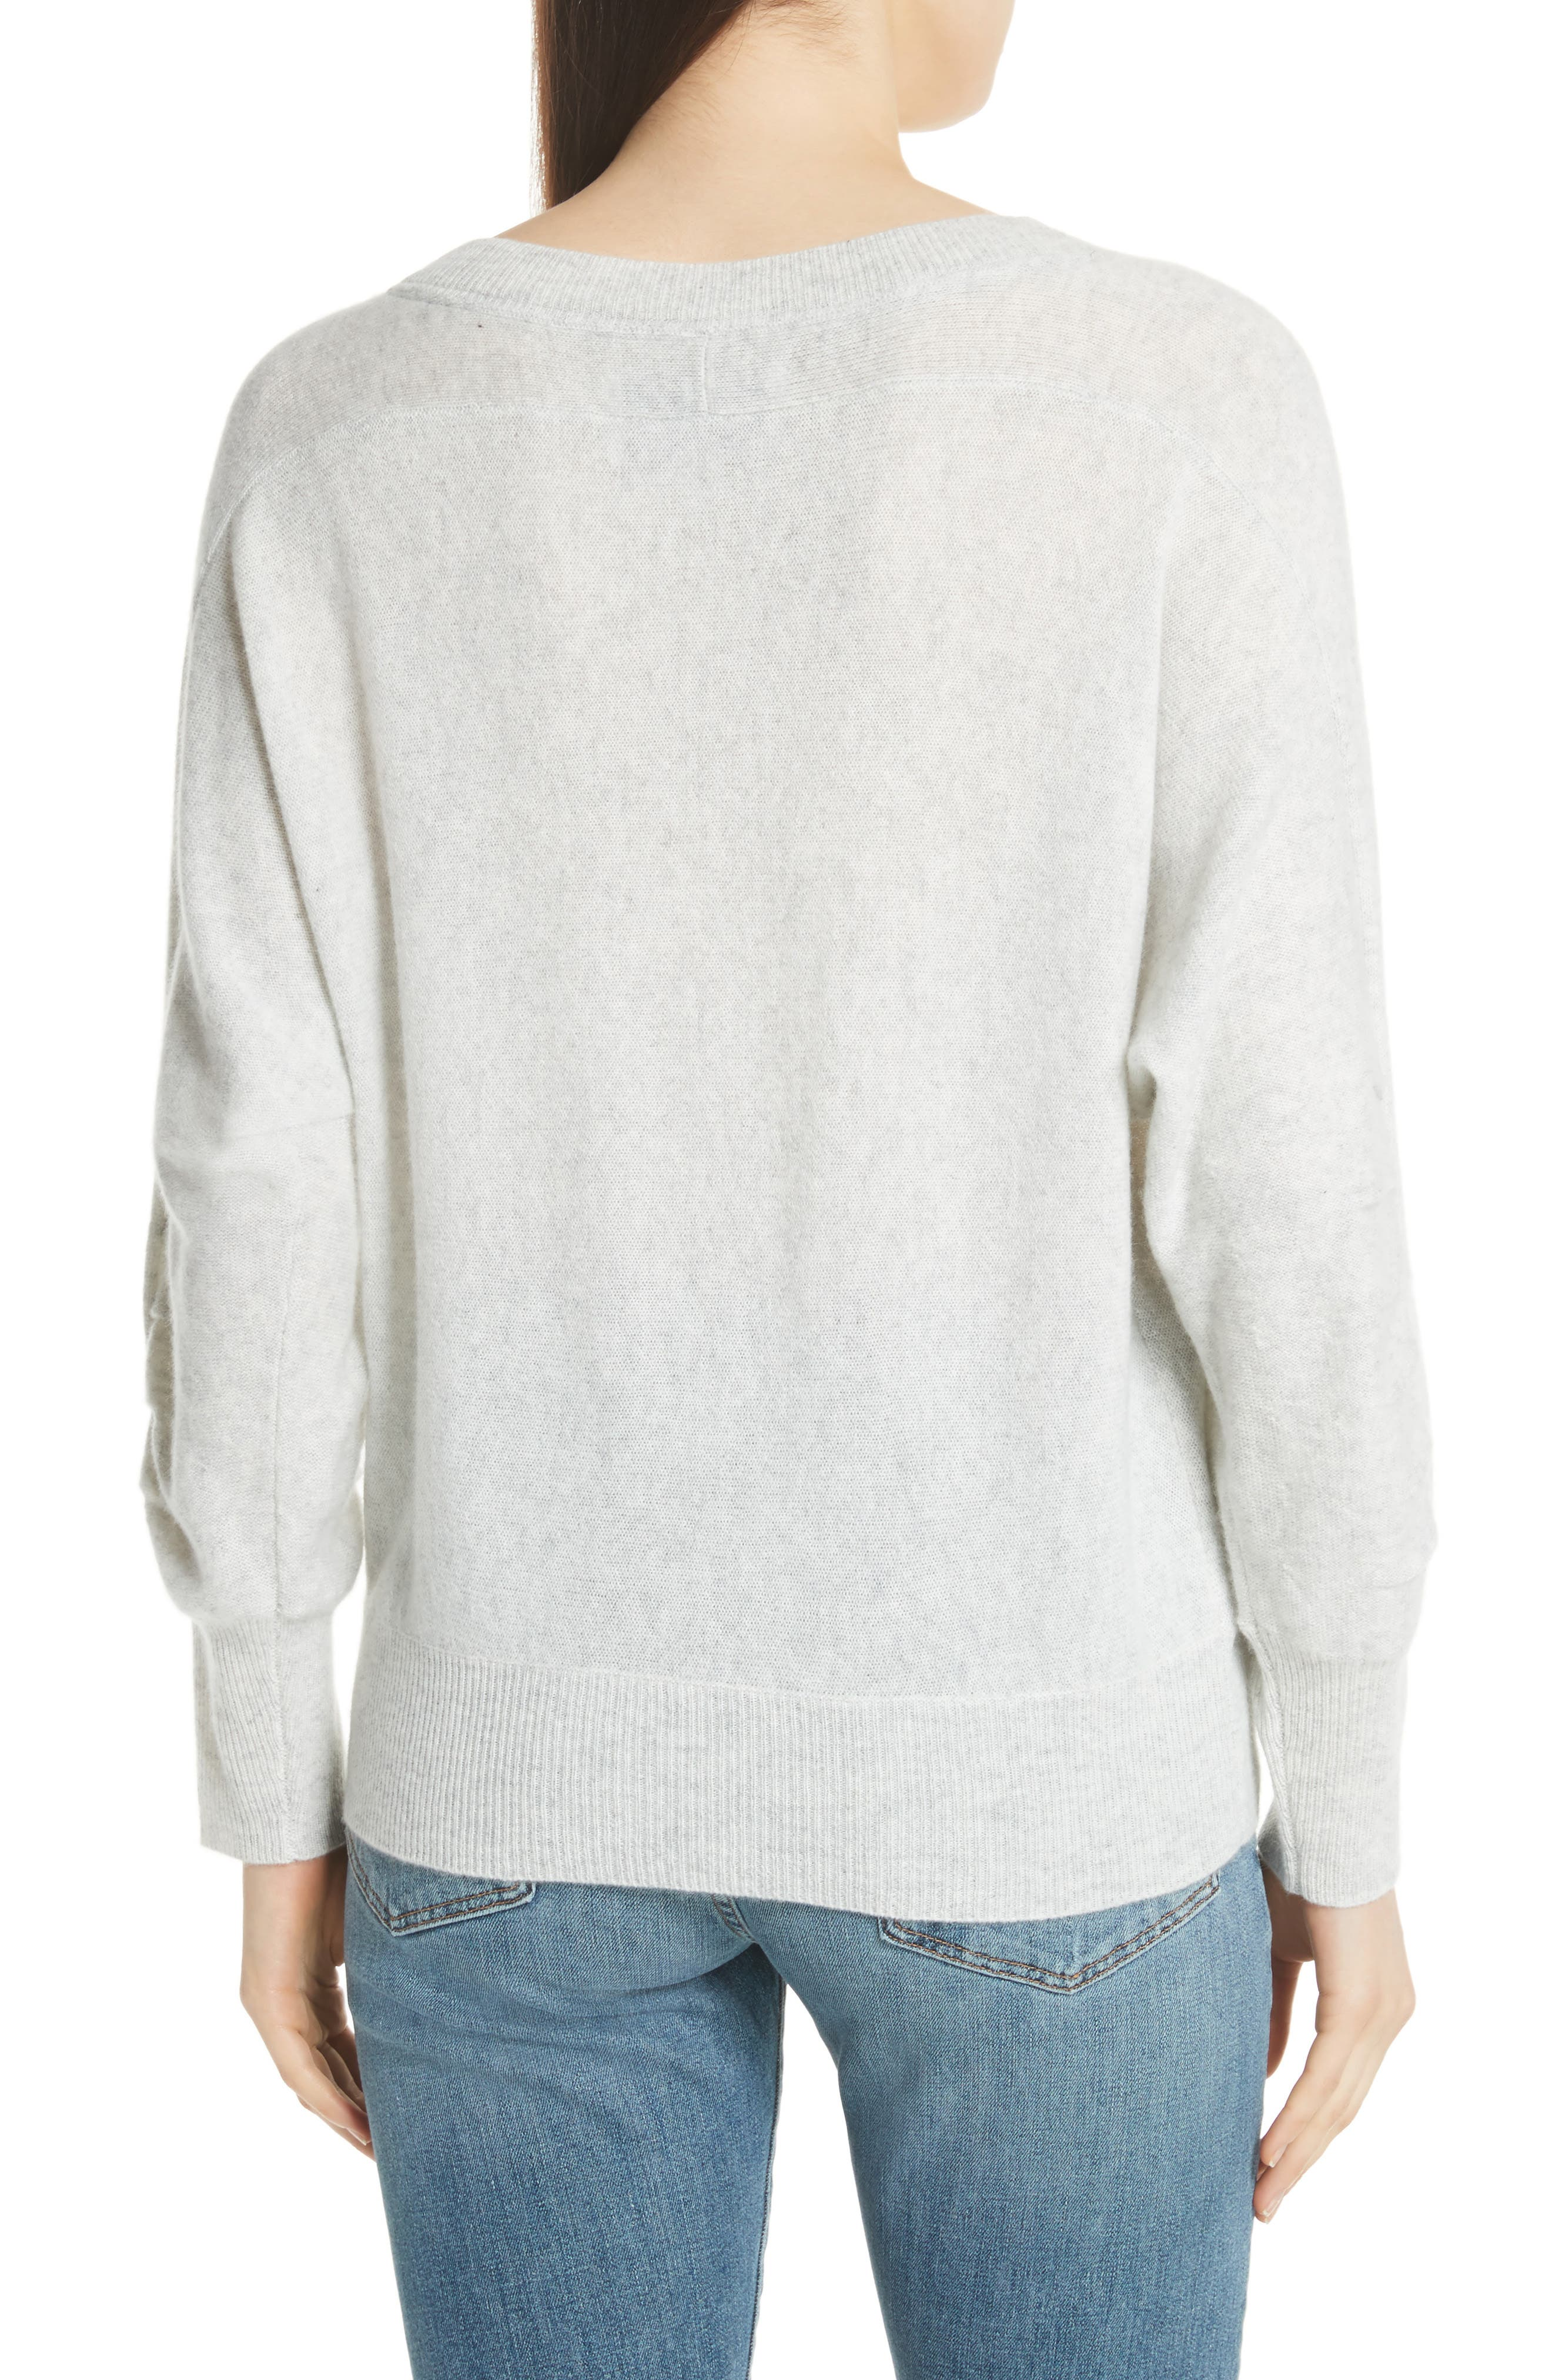 Weller Cashmere Sweater,                             Alternate thumbnail 2, color,                             100